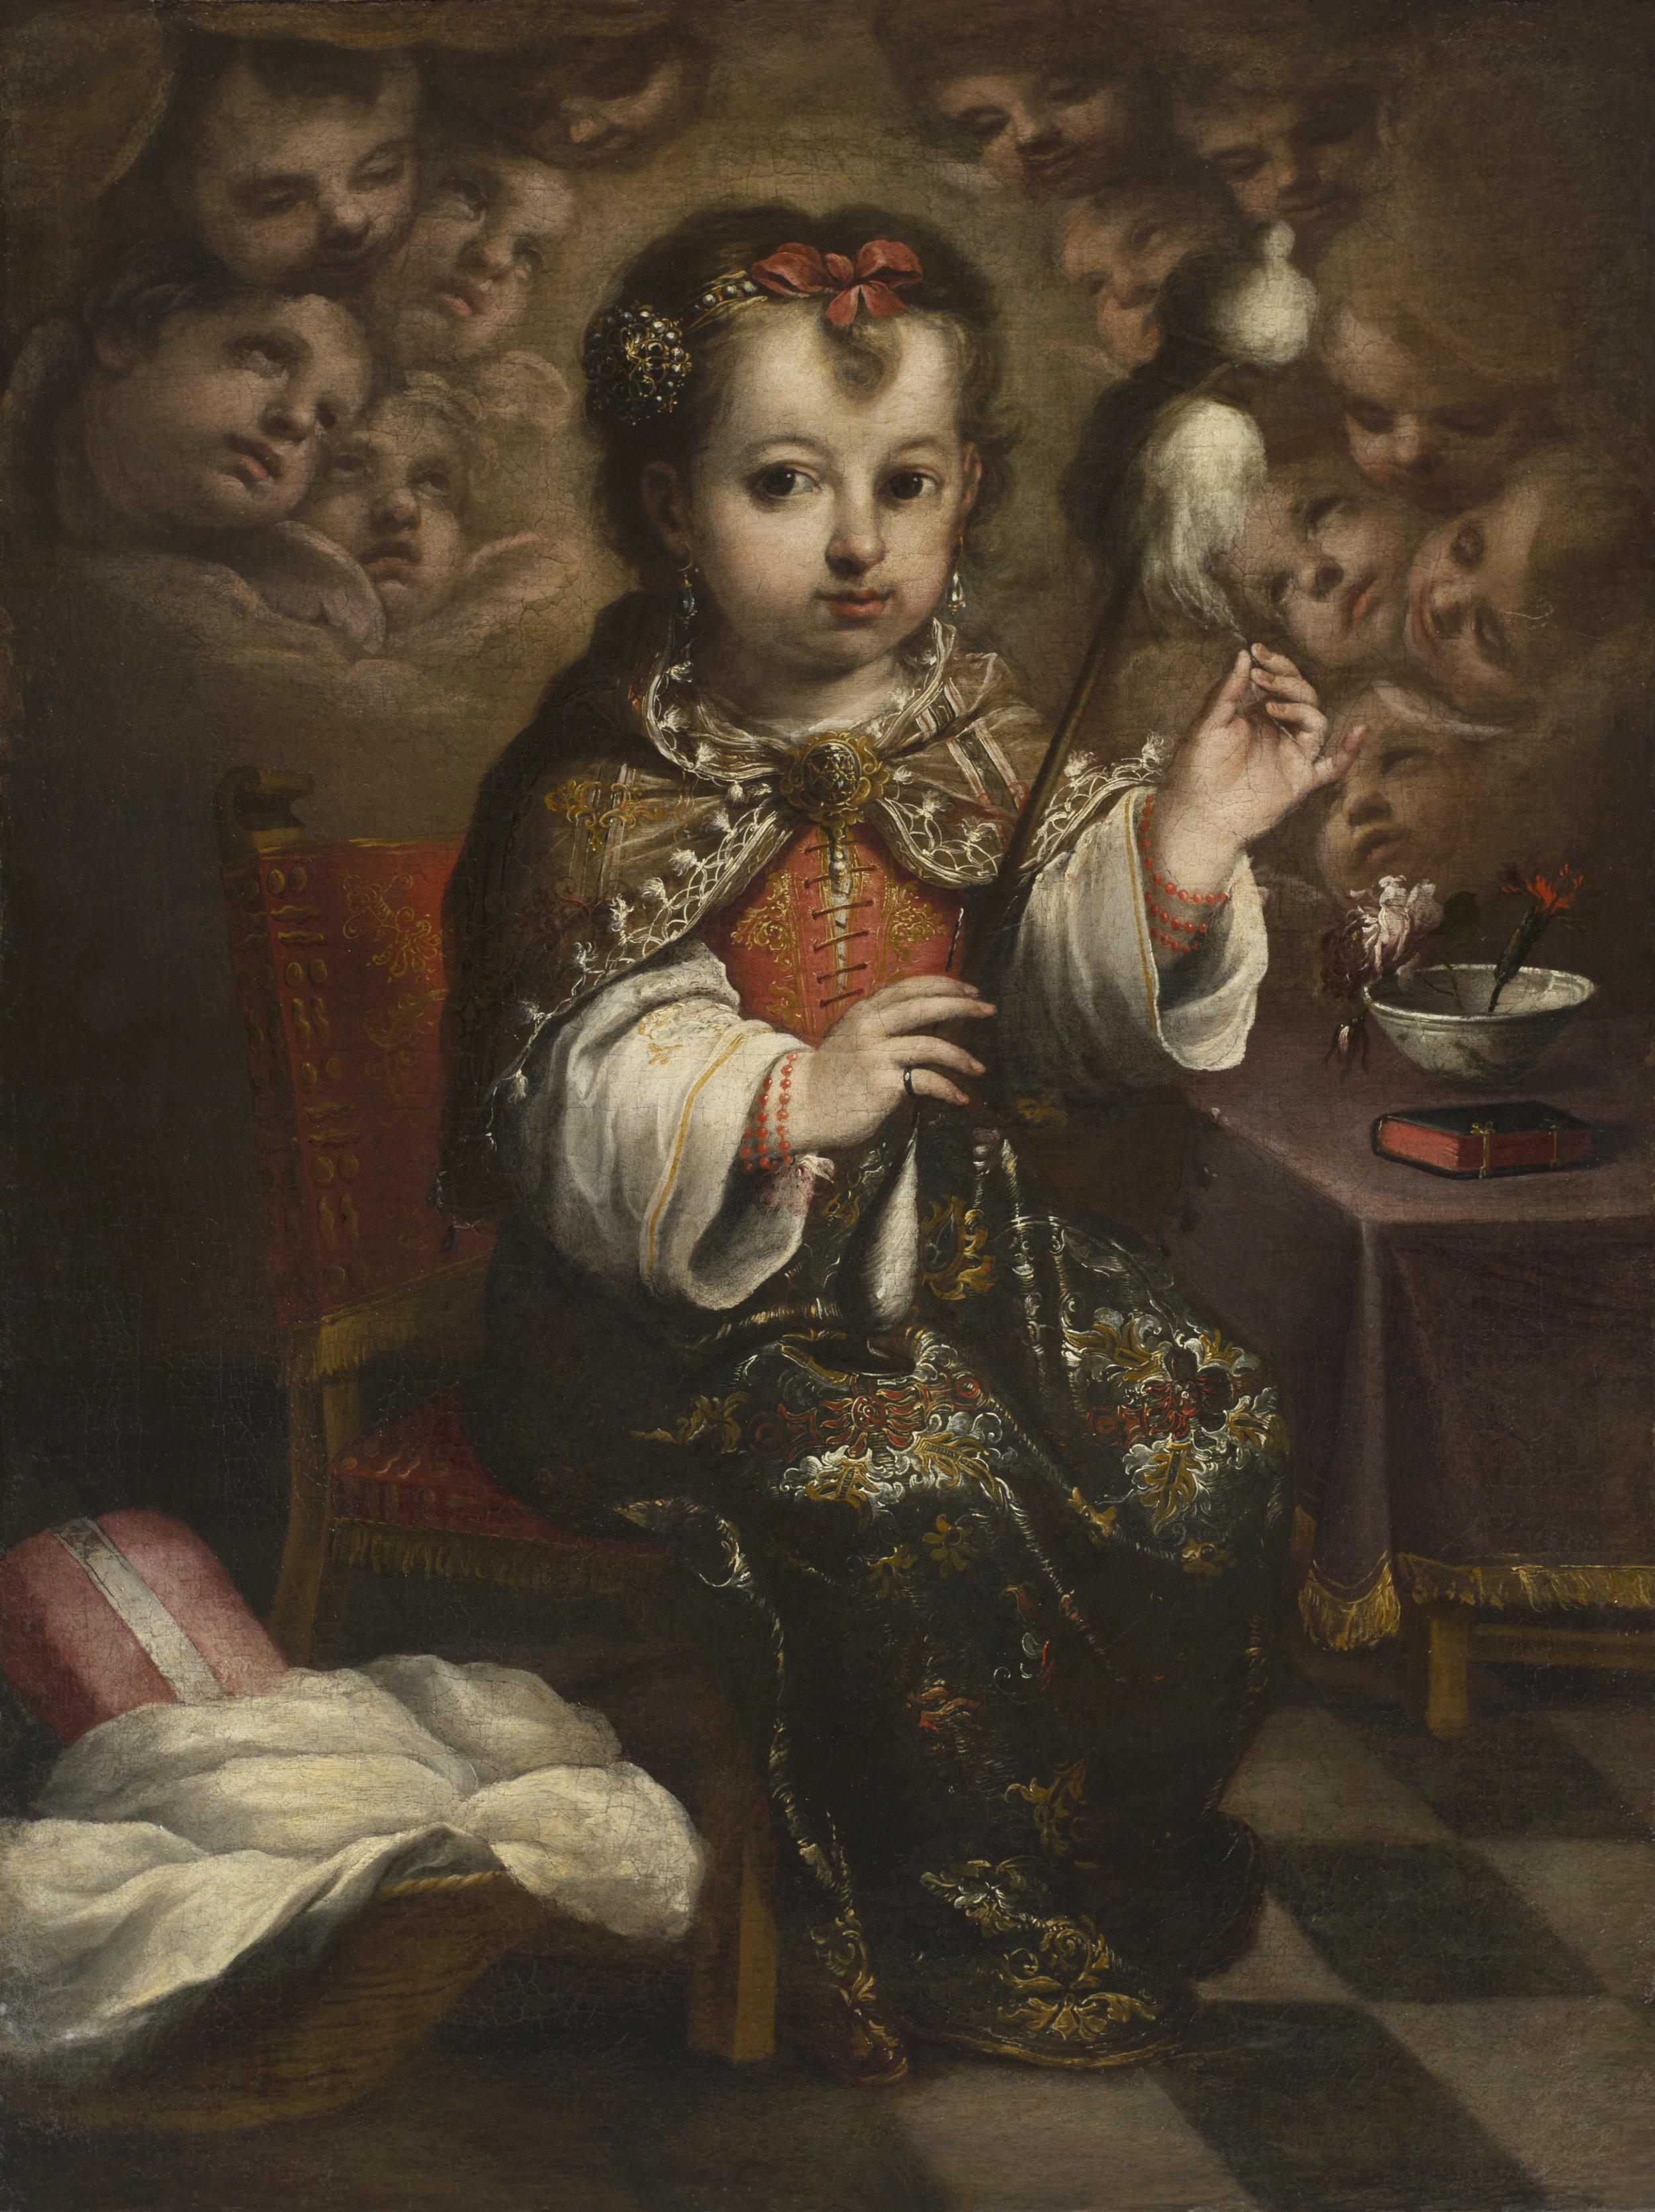 Juan Simón Gutiérrez  (Medina-Sidonia 1643 – 1718 Seville)  The Child Virgin Spinning  ( La Virgen niña hilando ) Oil on canvas, 30 ¼ x 22 ¾ inches (76.8 x 57.7 cm.)